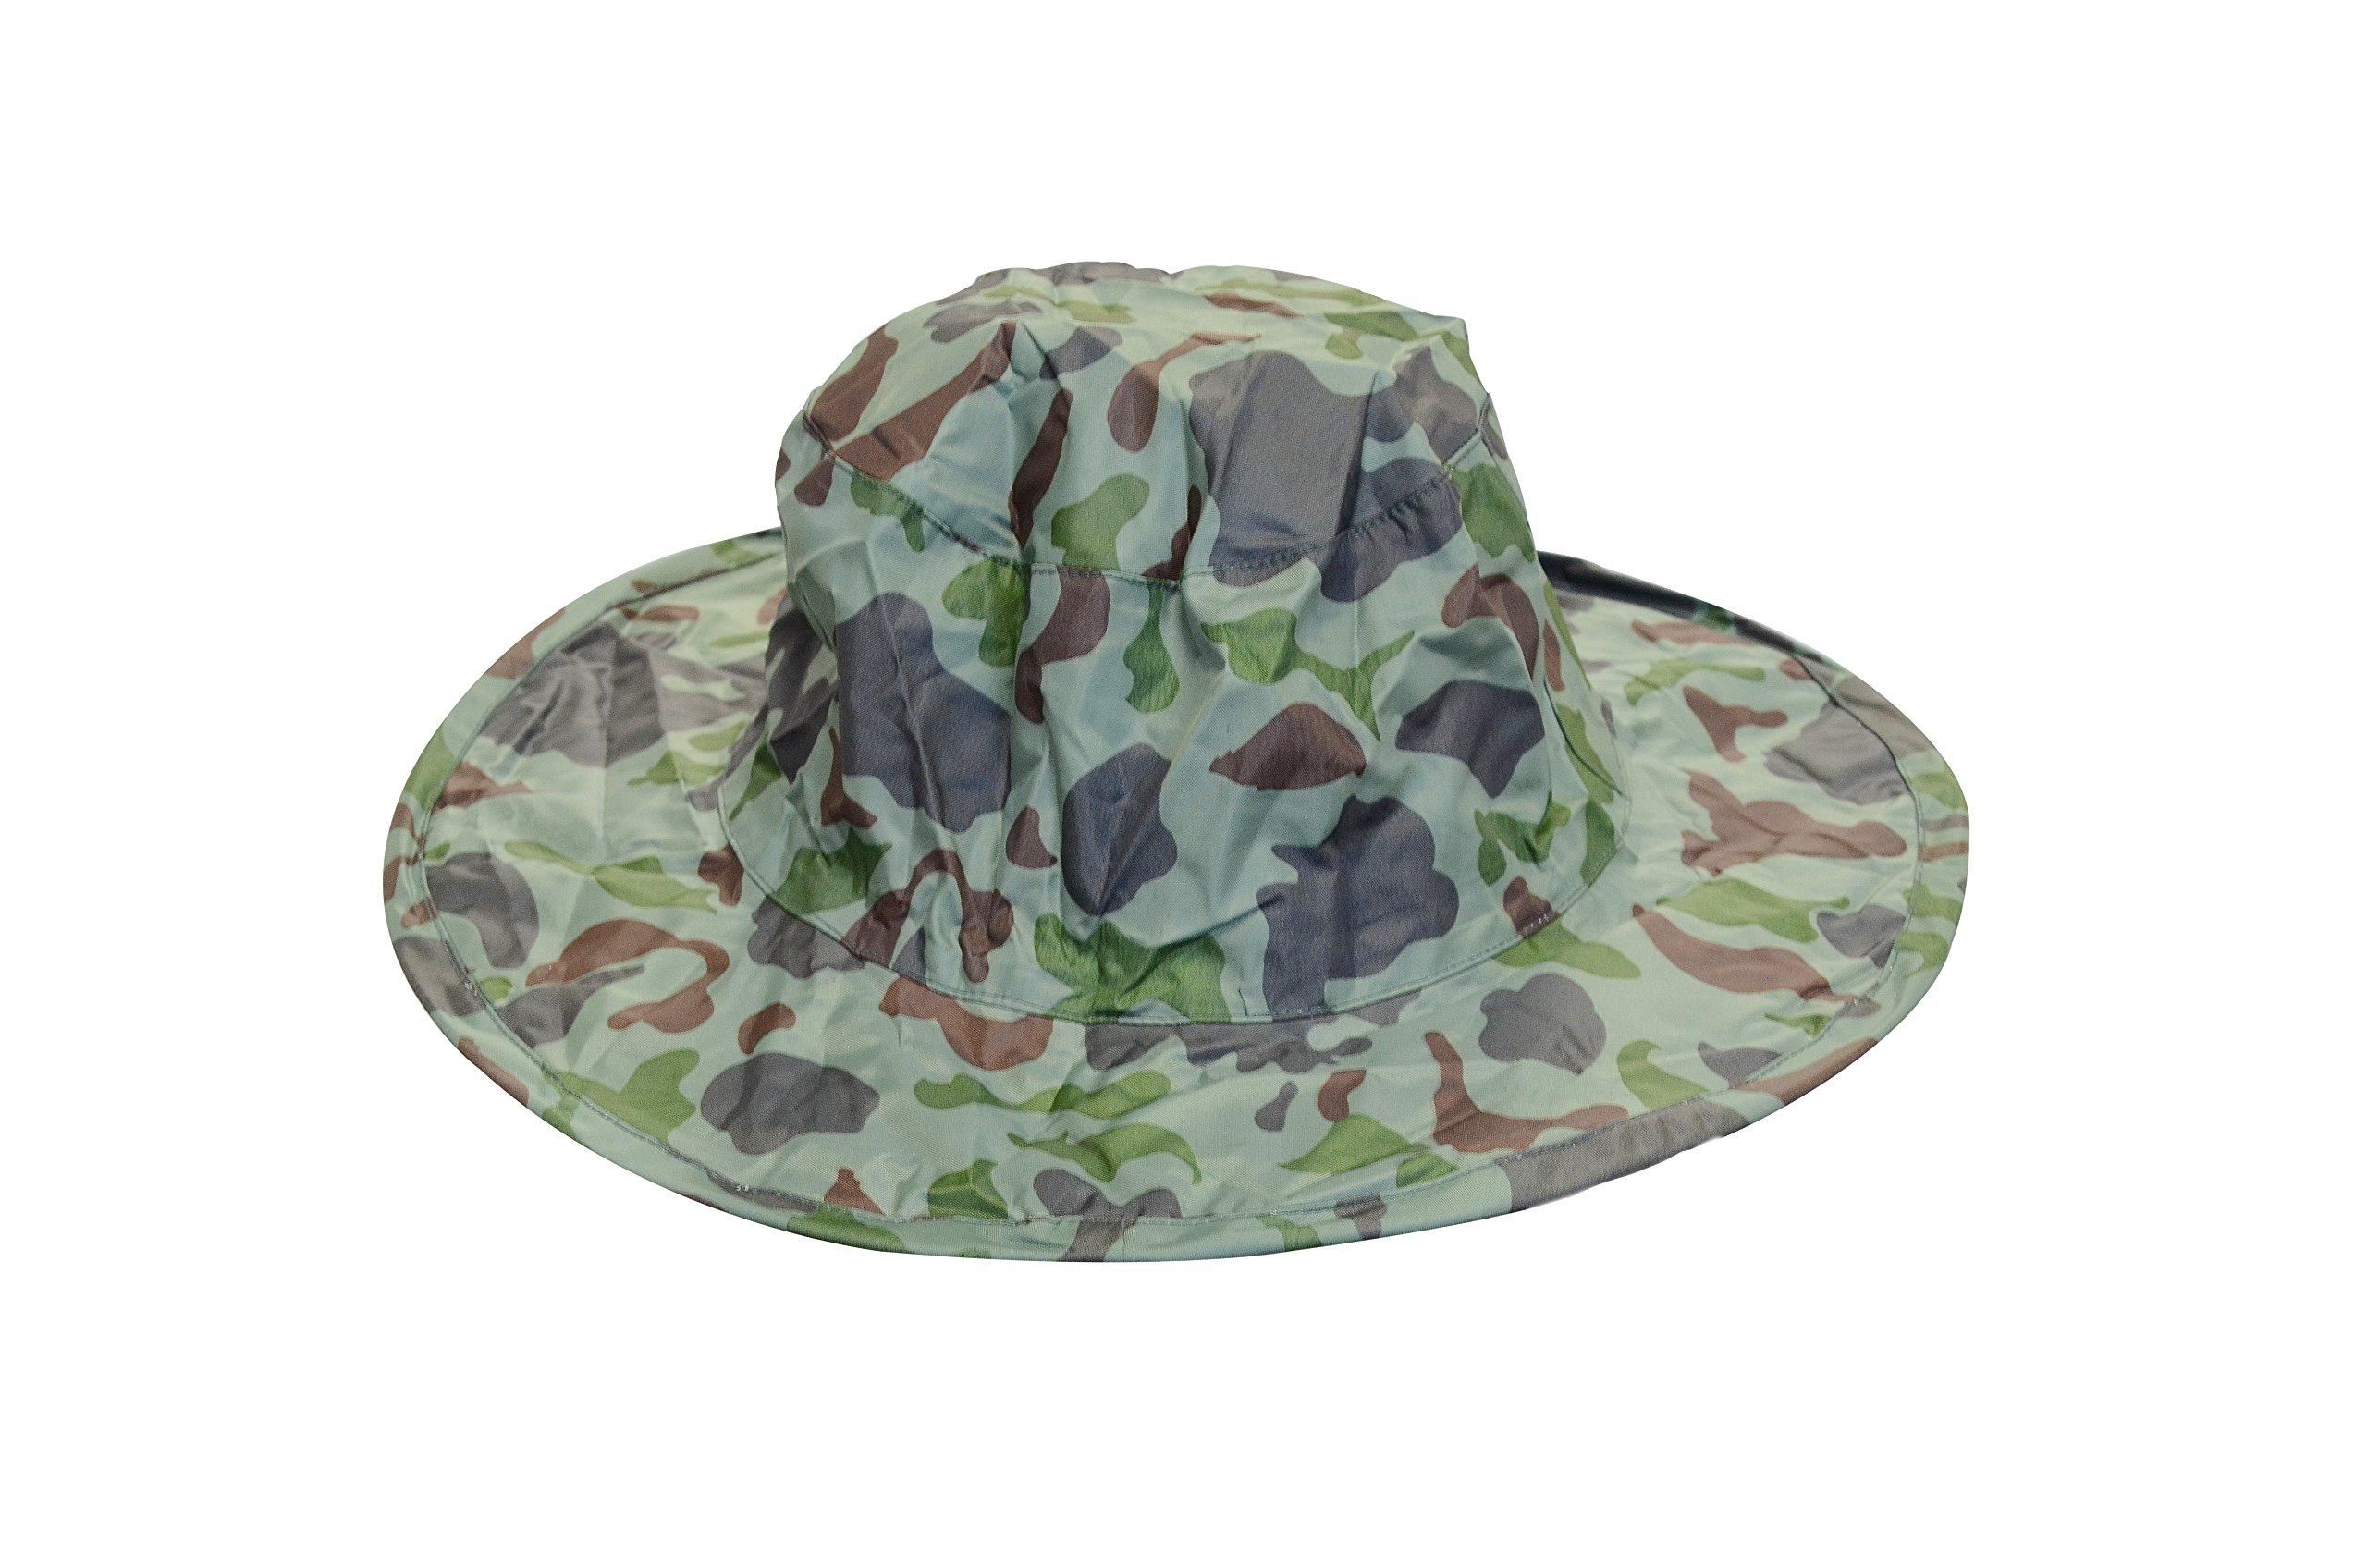 Twist-and-Fold Rain Hat, Unisex, 13 in diameter brim, Camouflage